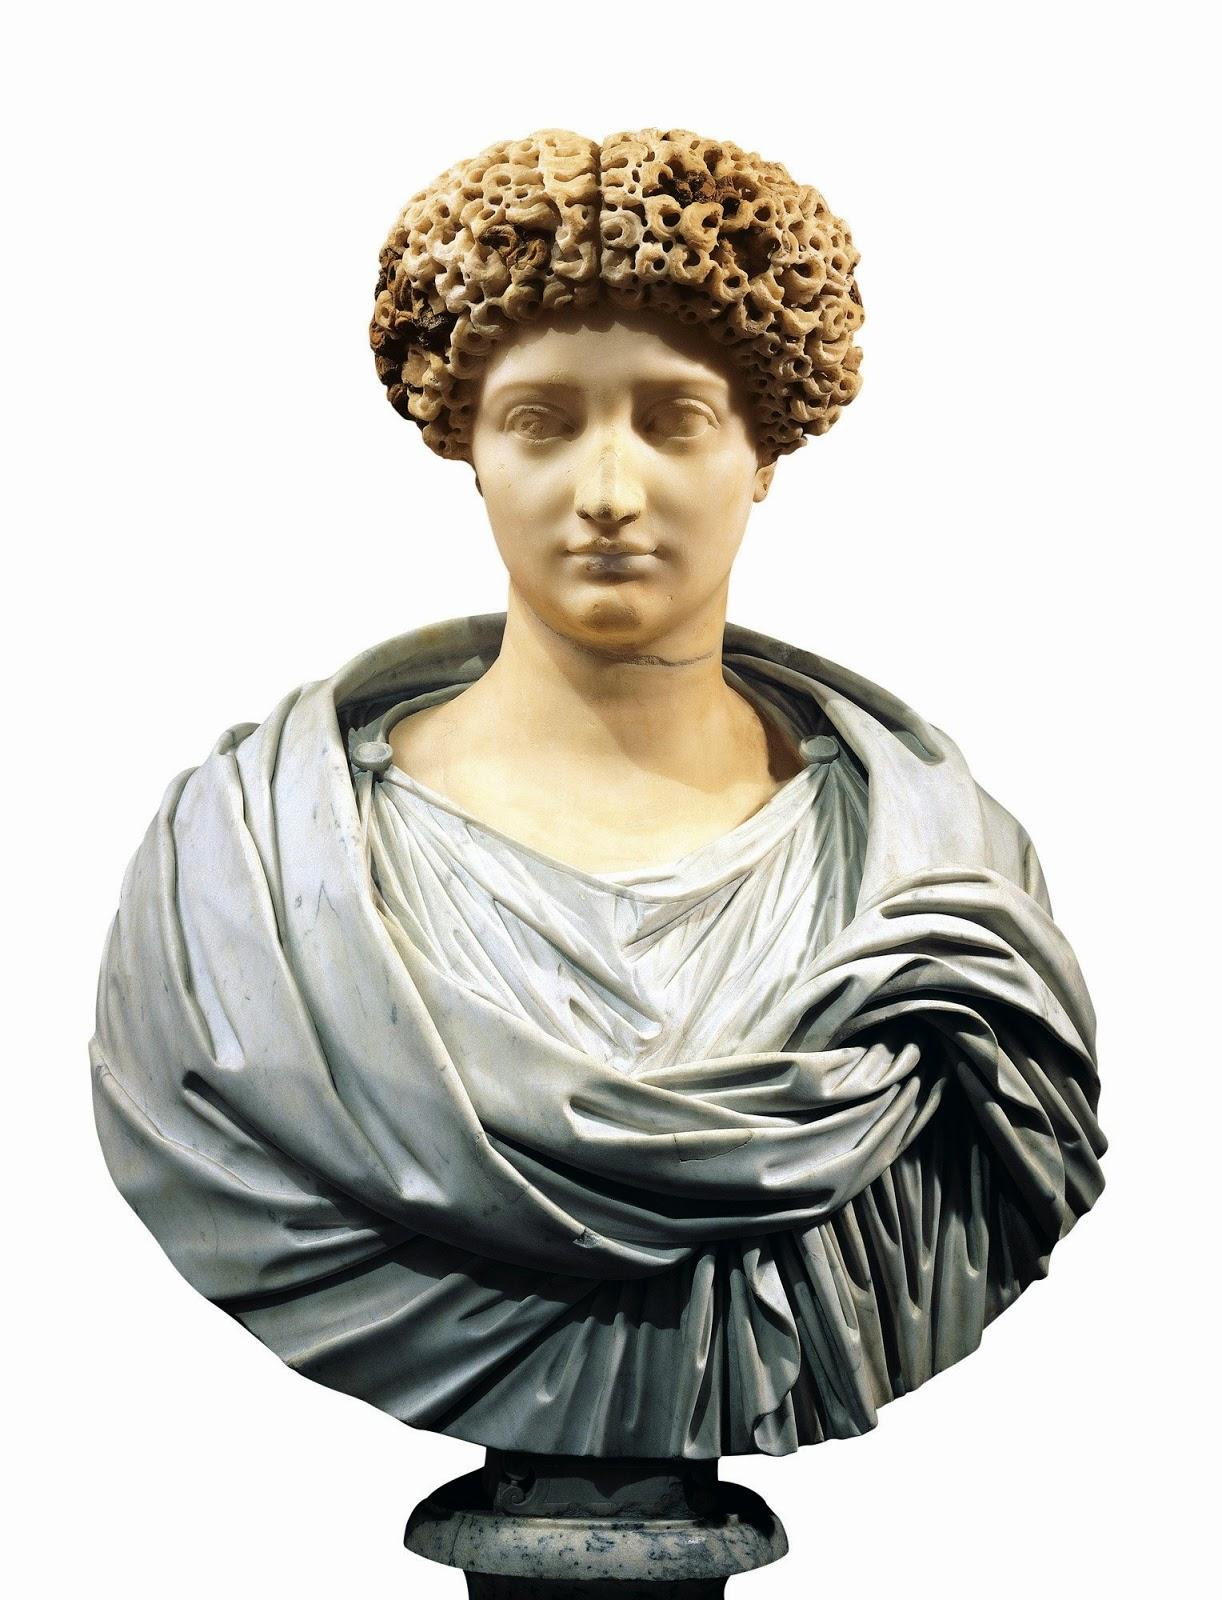 Julia, hija de Augusto.  Busto de mármol. siglo I a.C. Museo Nacional Romano, Palacio Altemps, Roma.